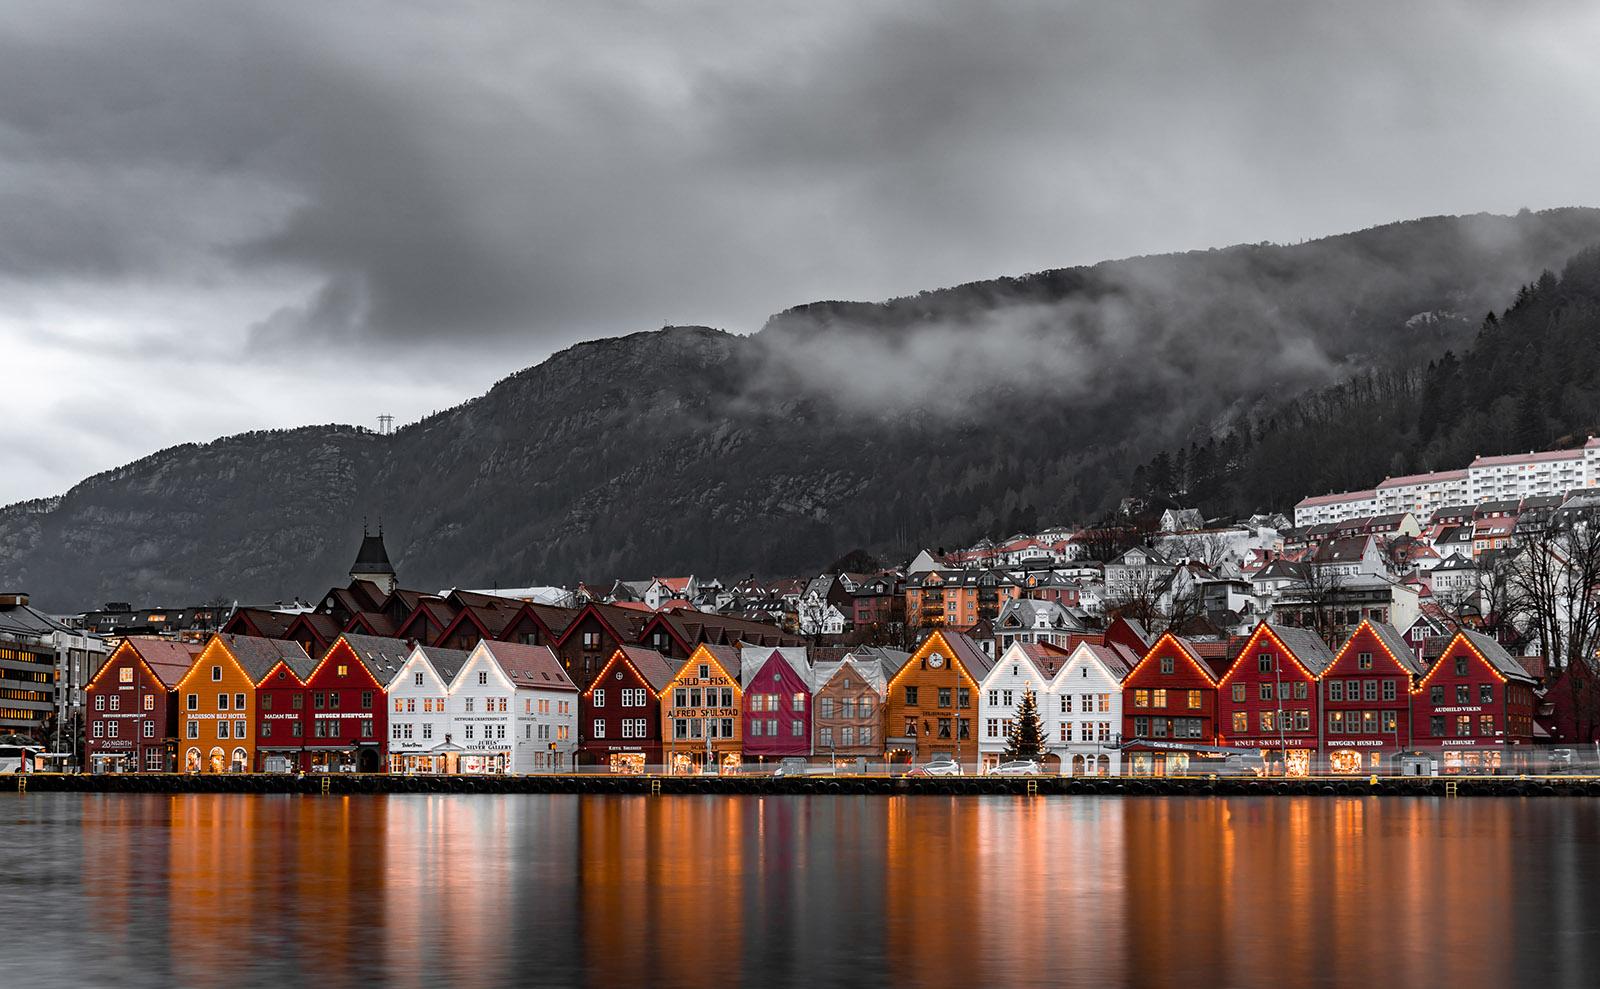 Bergen Norway, Reading Beowulf, Krampus, Gingerbread & More: Endnotes 11 December